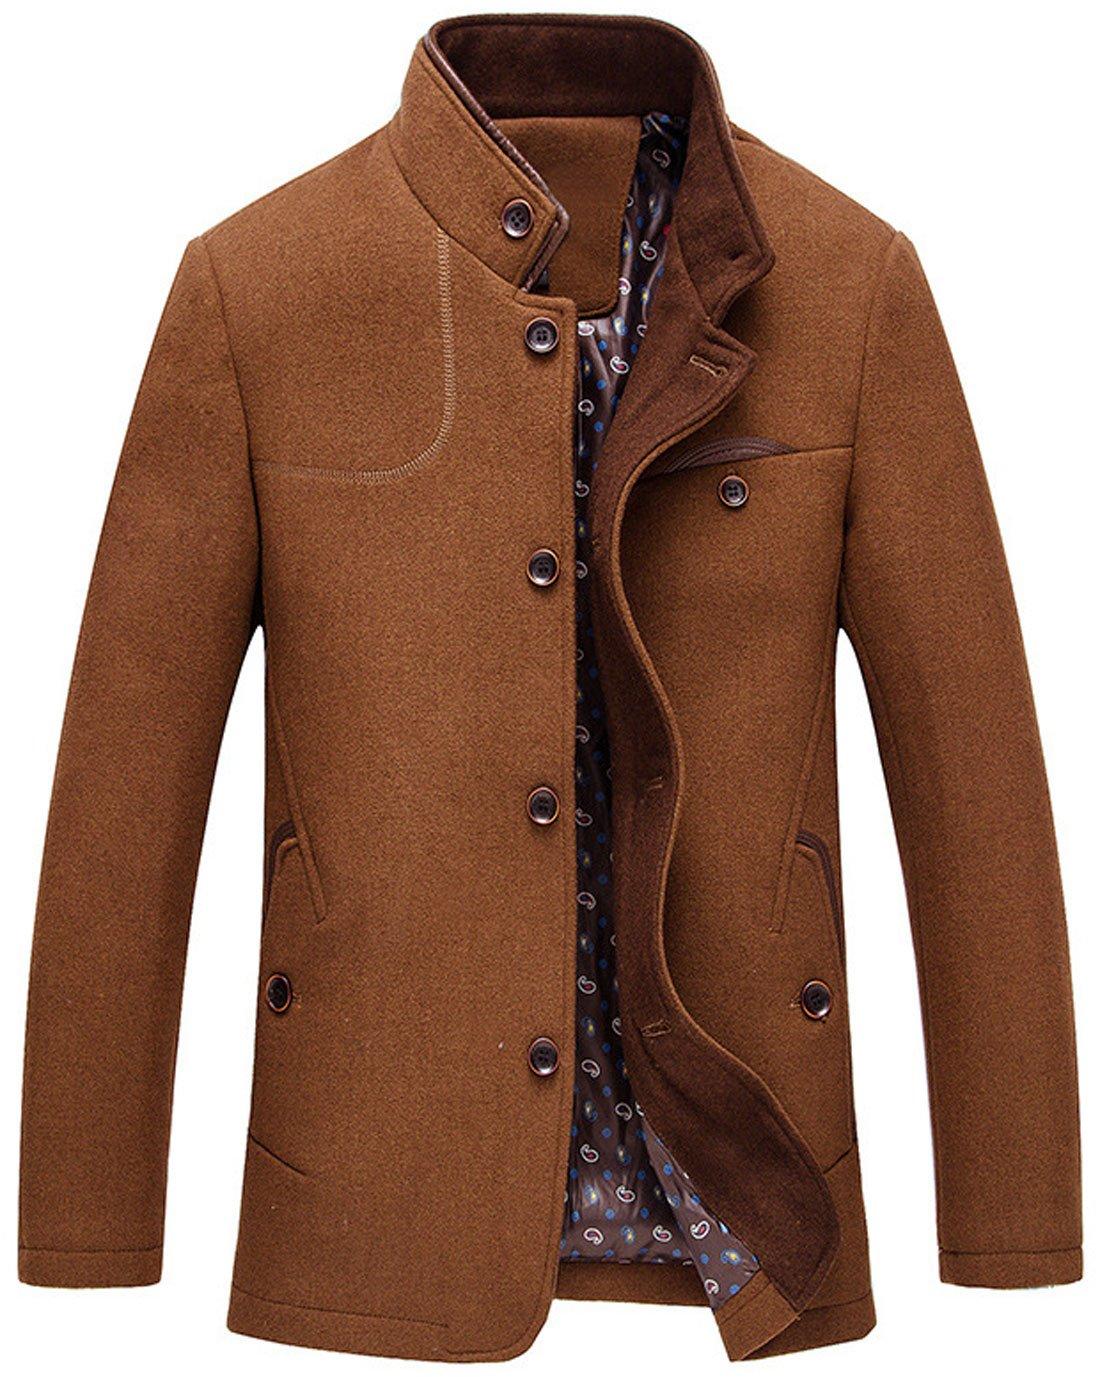 chouyatou Men's Gentle Band Collar Single Breasted Wool Blend Pea Coat (Brown, Medium) by chouyatou